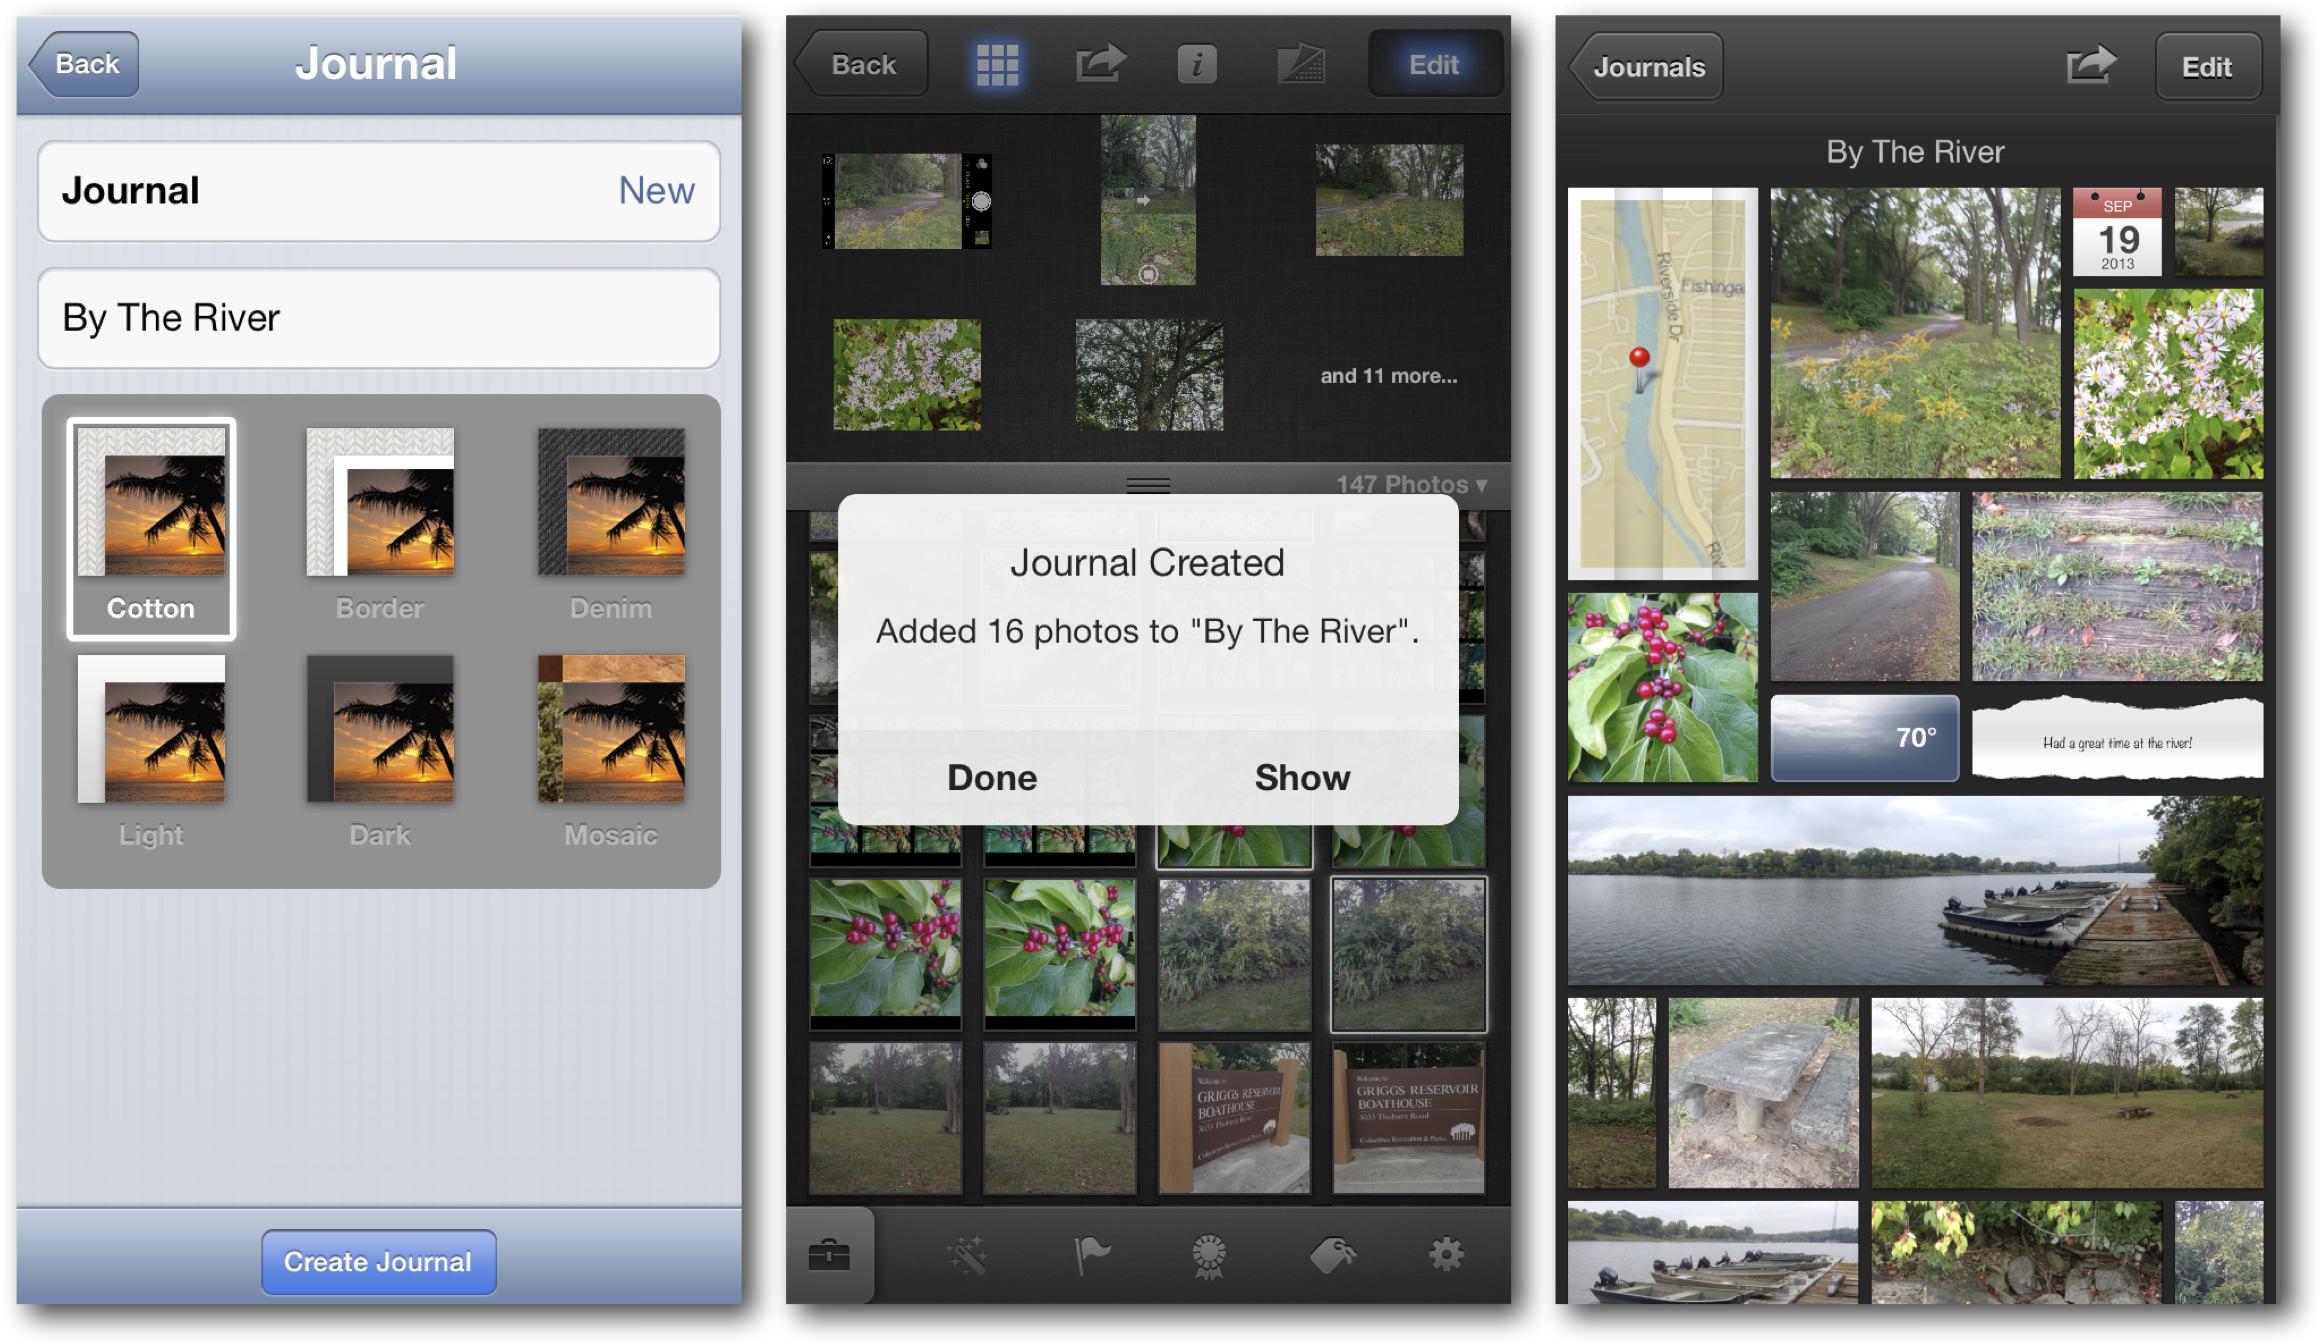 iOS 7 iPhoto Journals